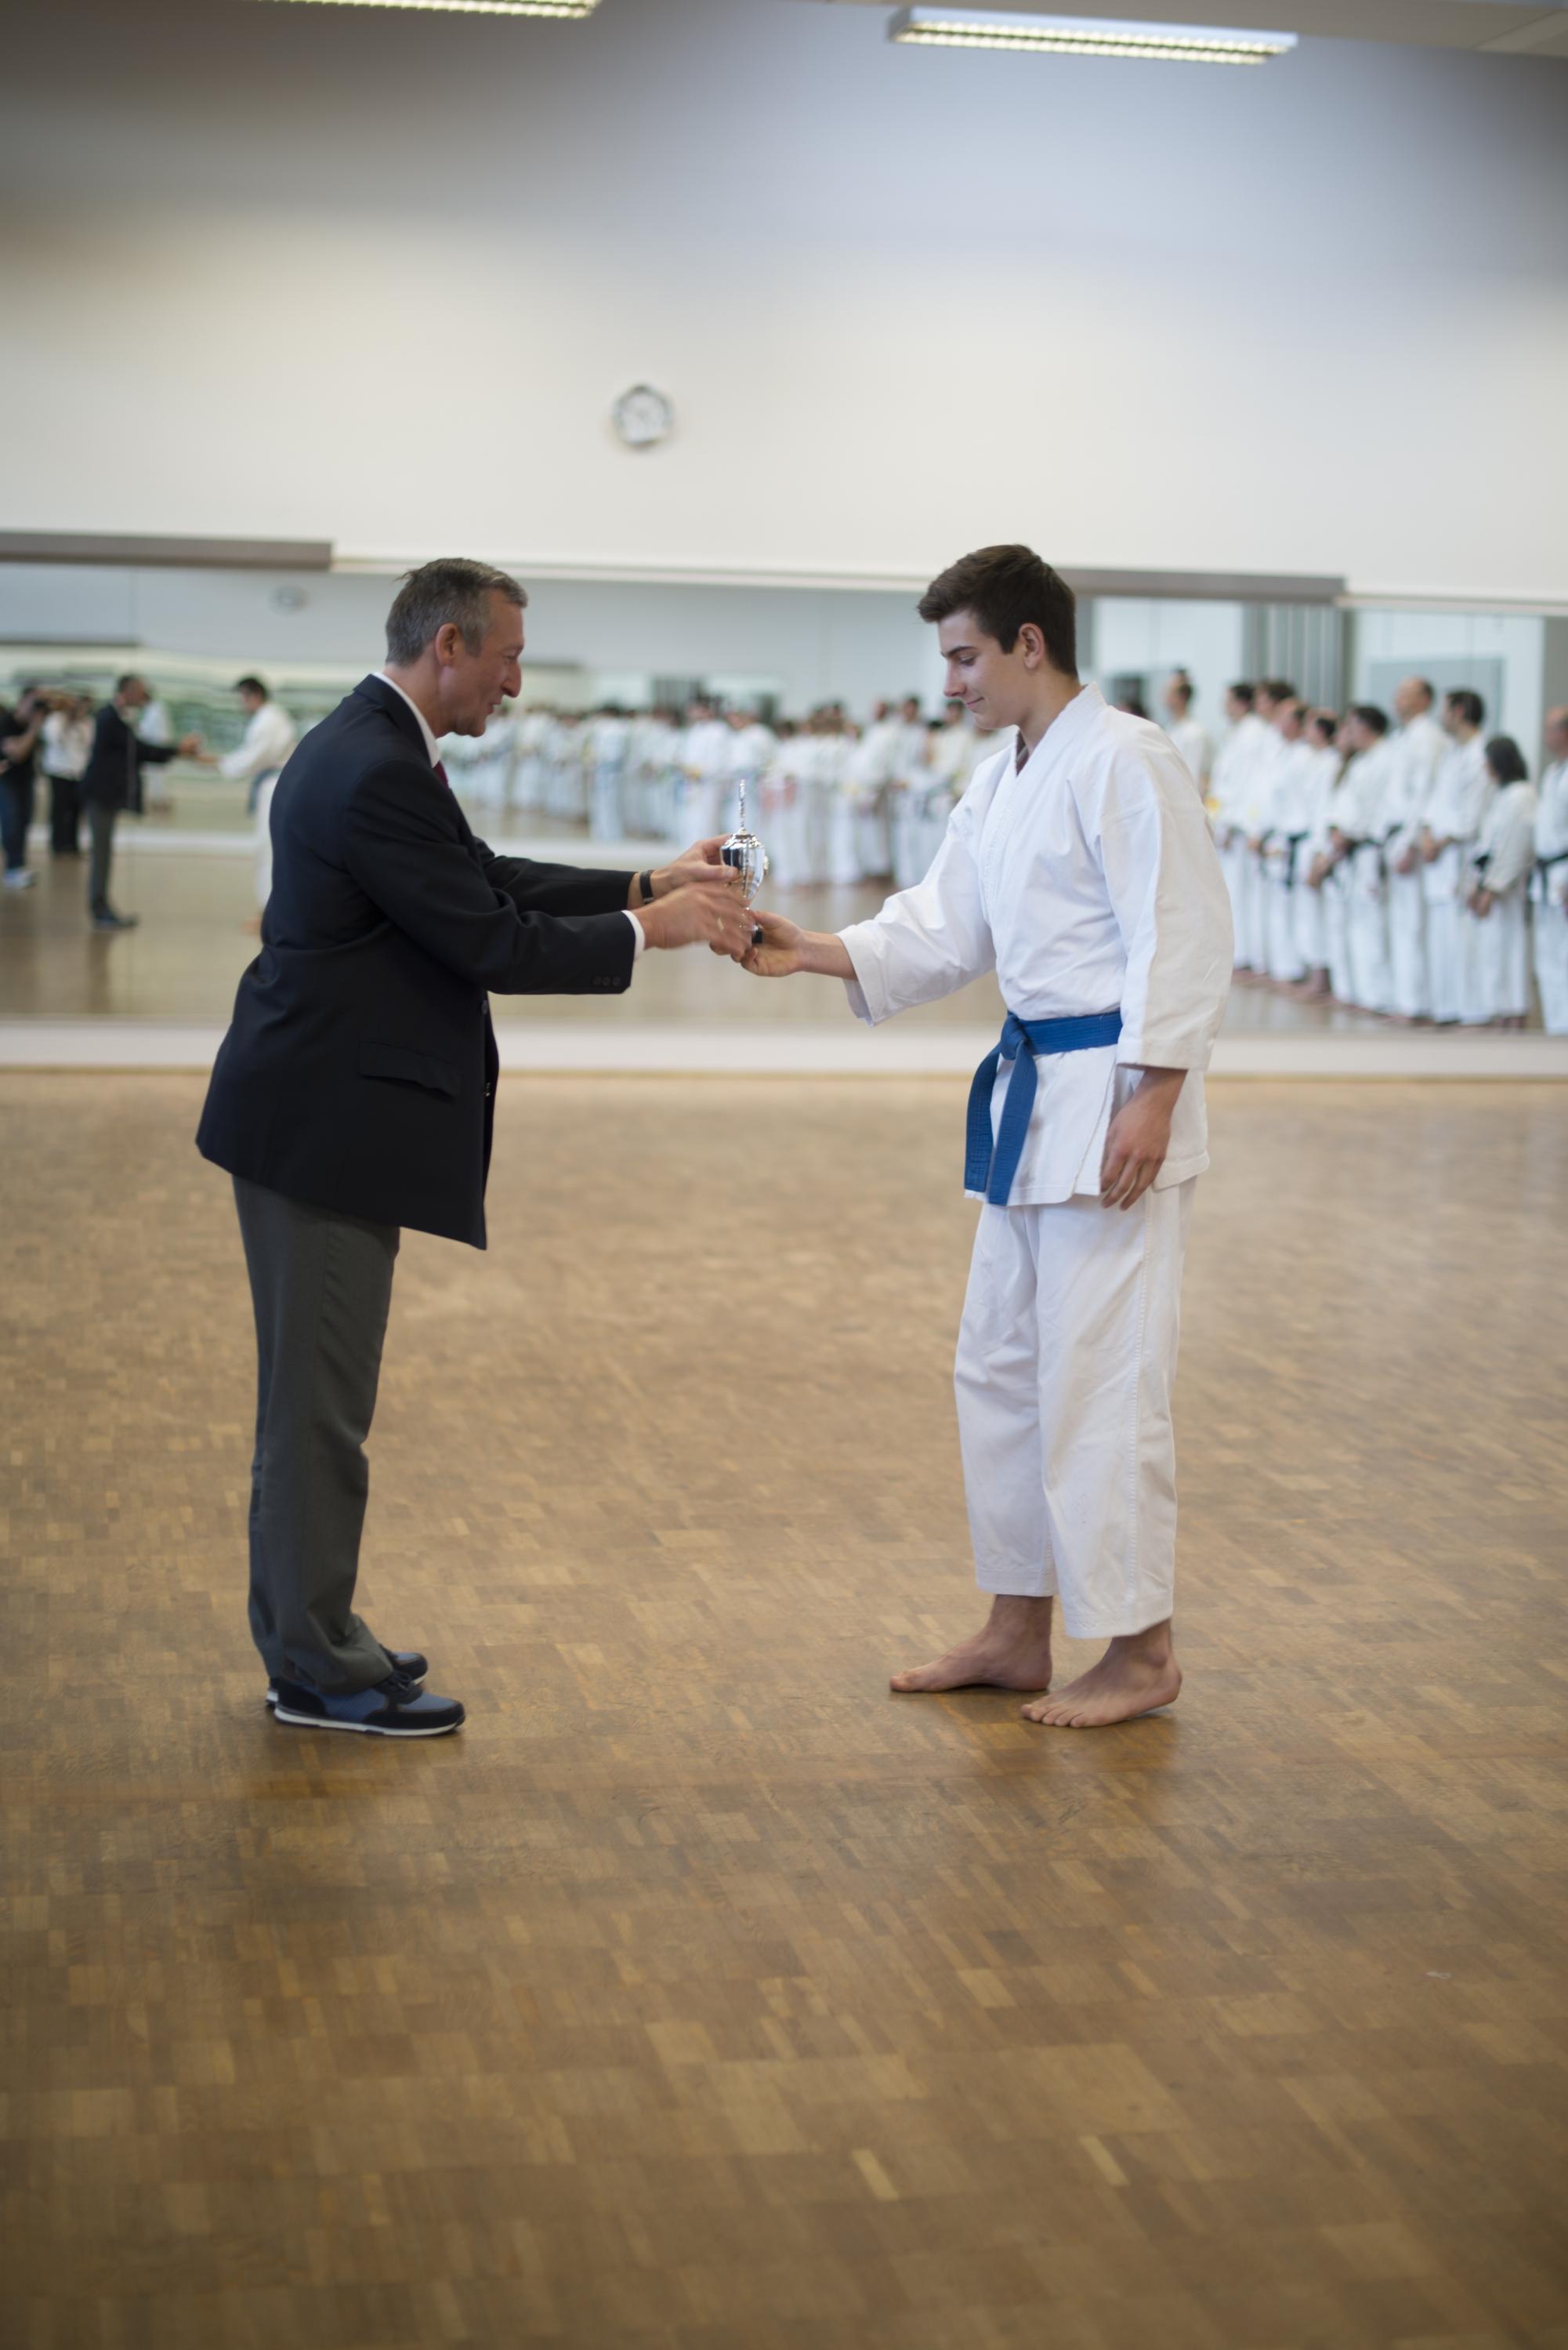 2016-04-26 Kata Turnier Kaarst 335